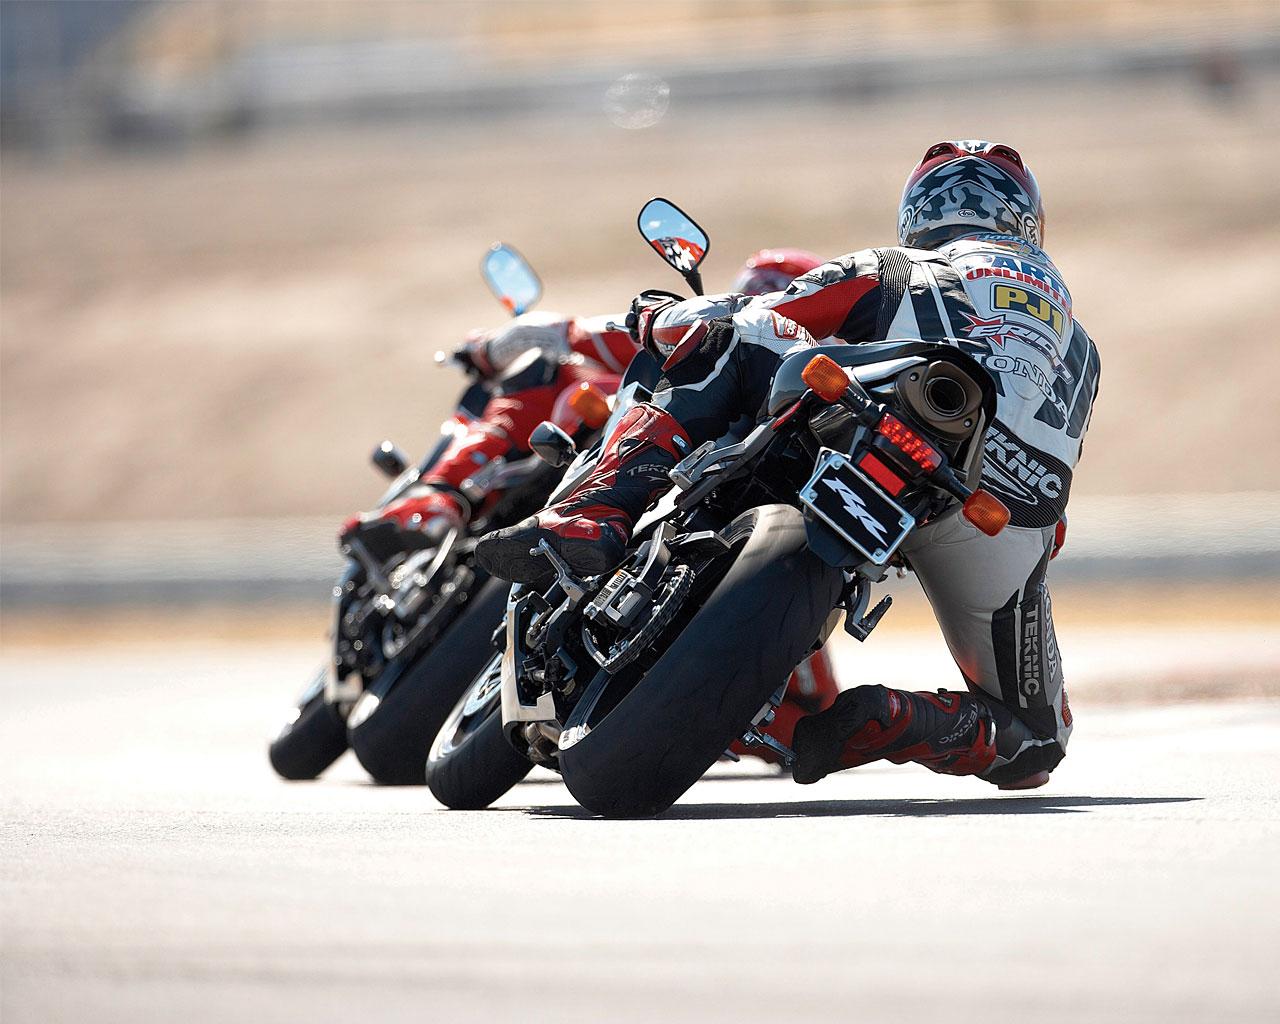 Honda Cbr 600rr   Superbike Racing 1004704   HD Wallpaper Download 1280x1024